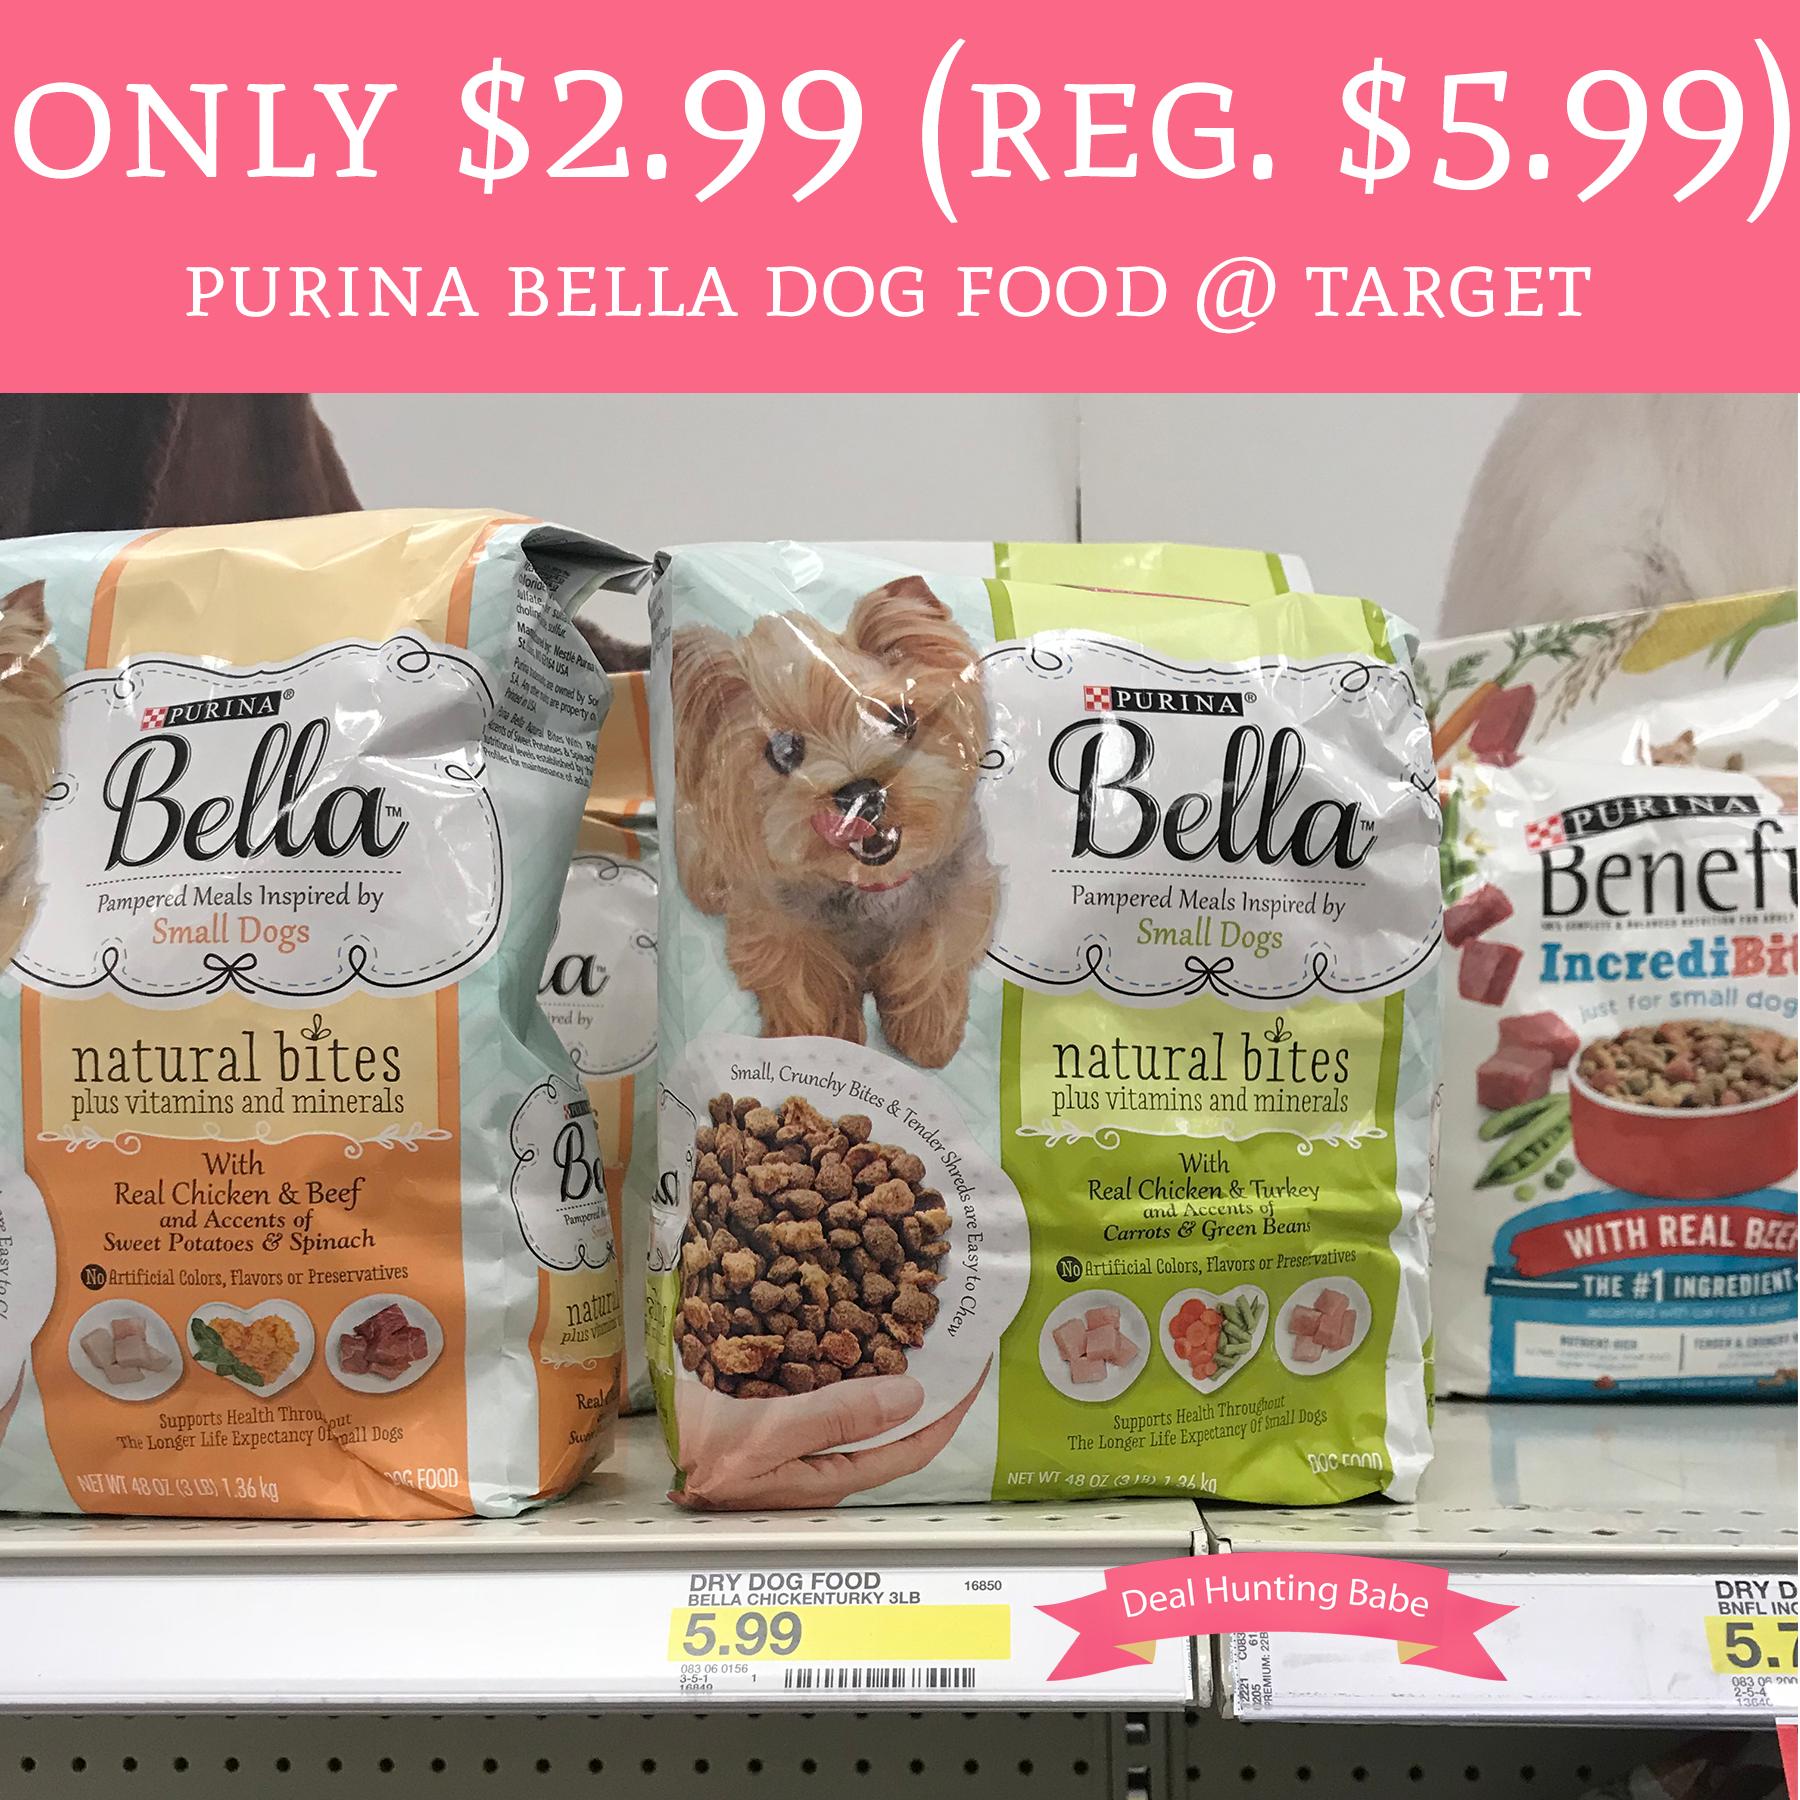 Only 2 99 Regular 5 99 Purina Bella Dry Dog Food